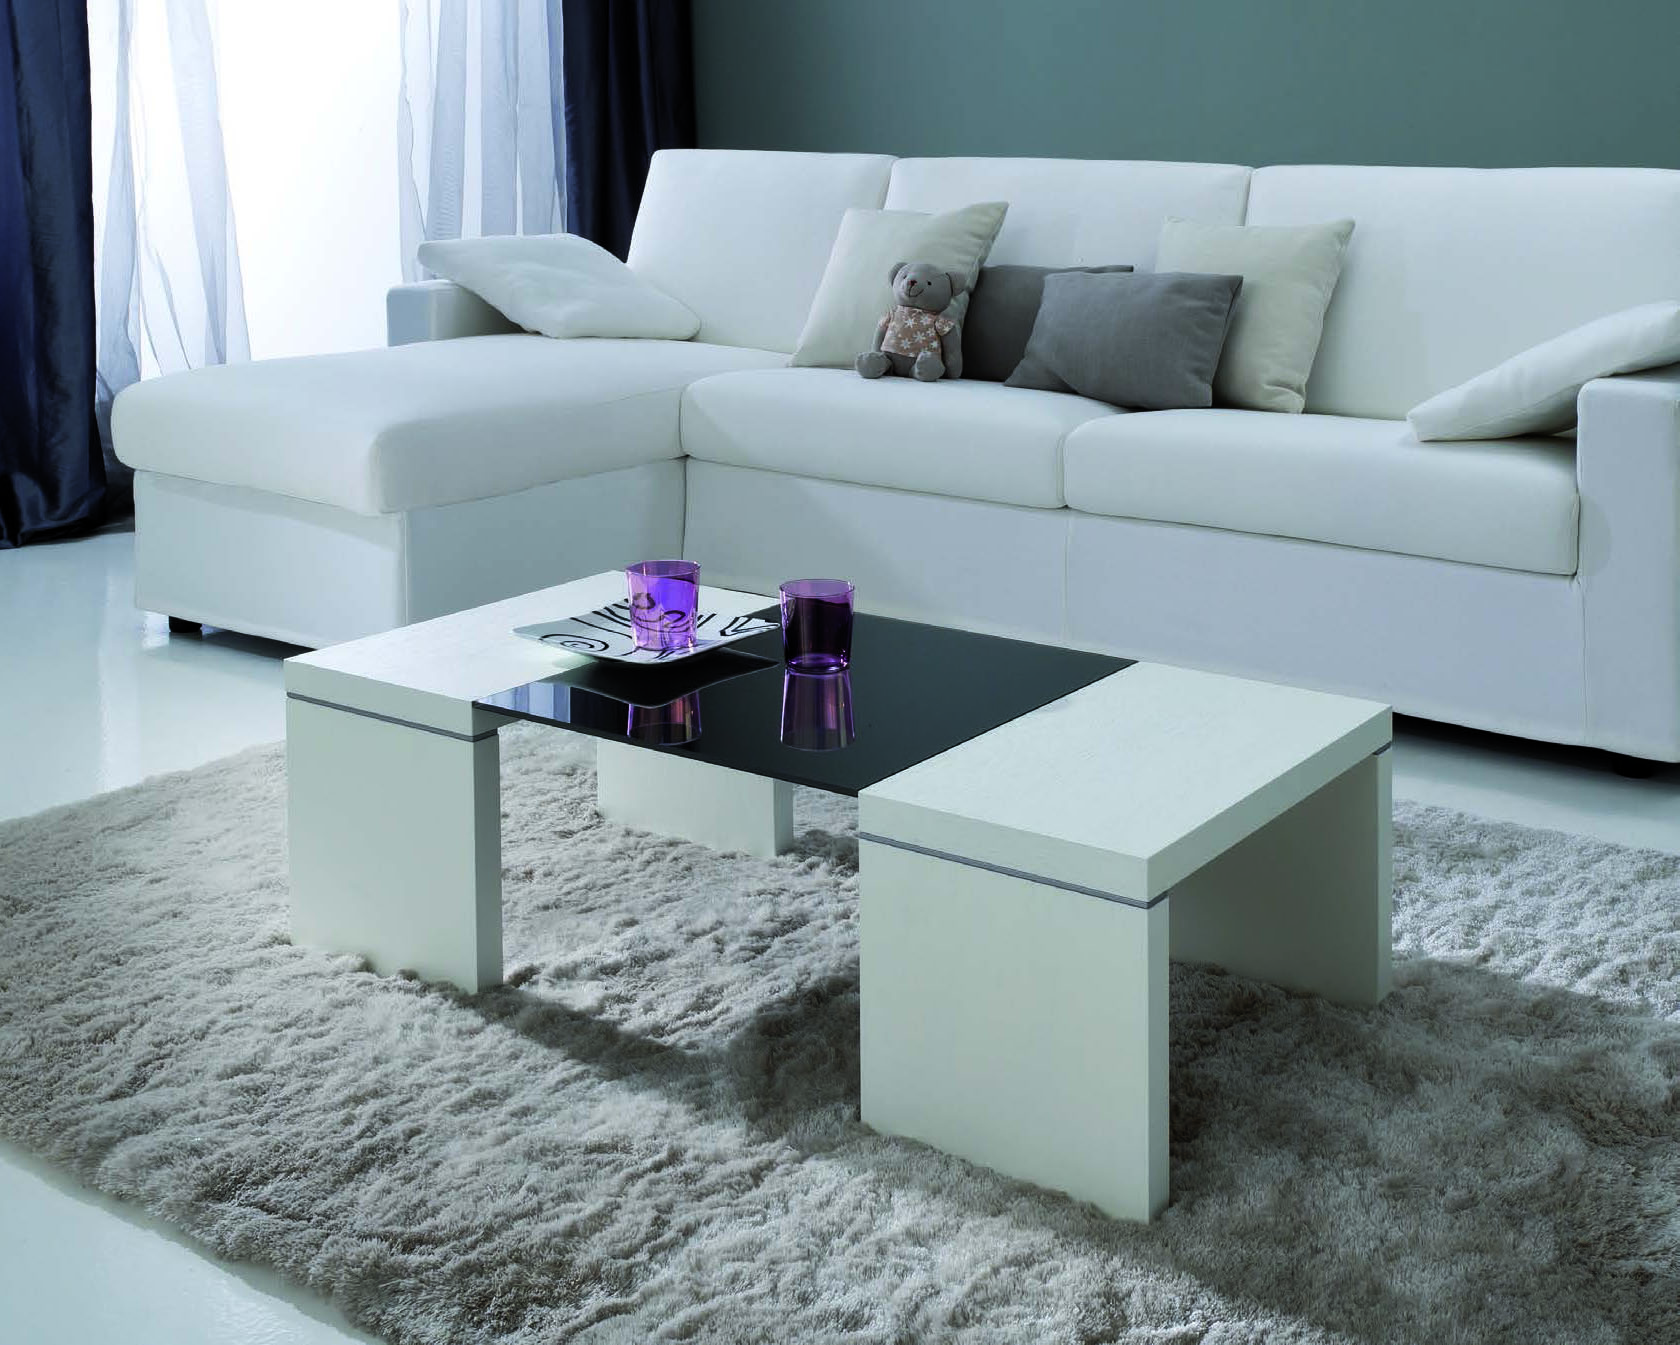 Ebay Tavolino Salotto Moderno : Ebay tavolino salotto moderno ...